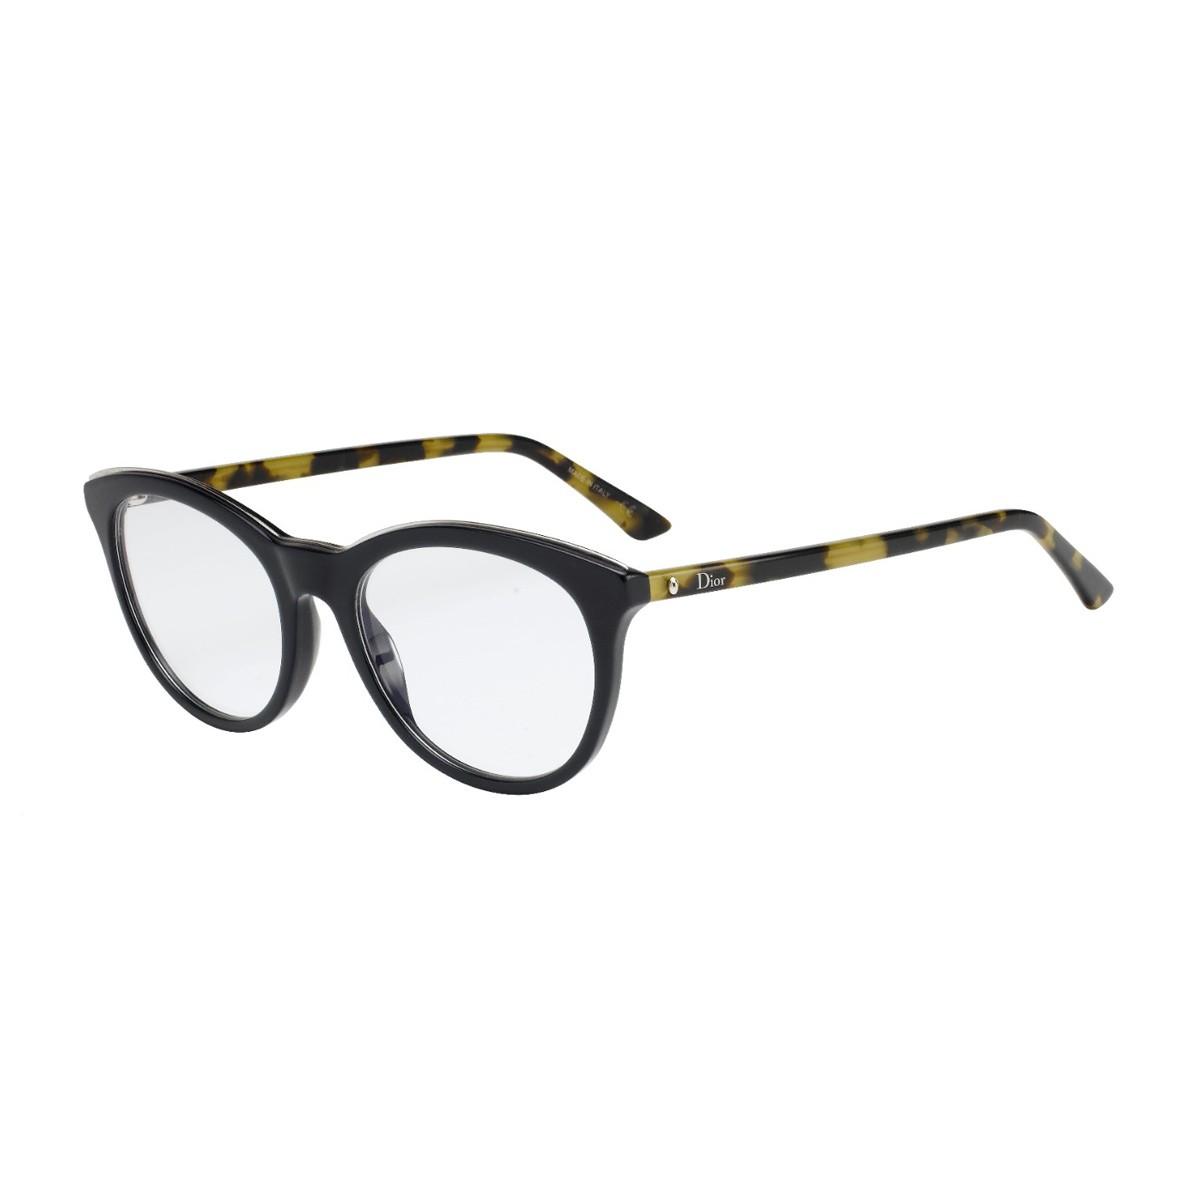 Dior Montaigne41 | Occhiali da vista Unisex